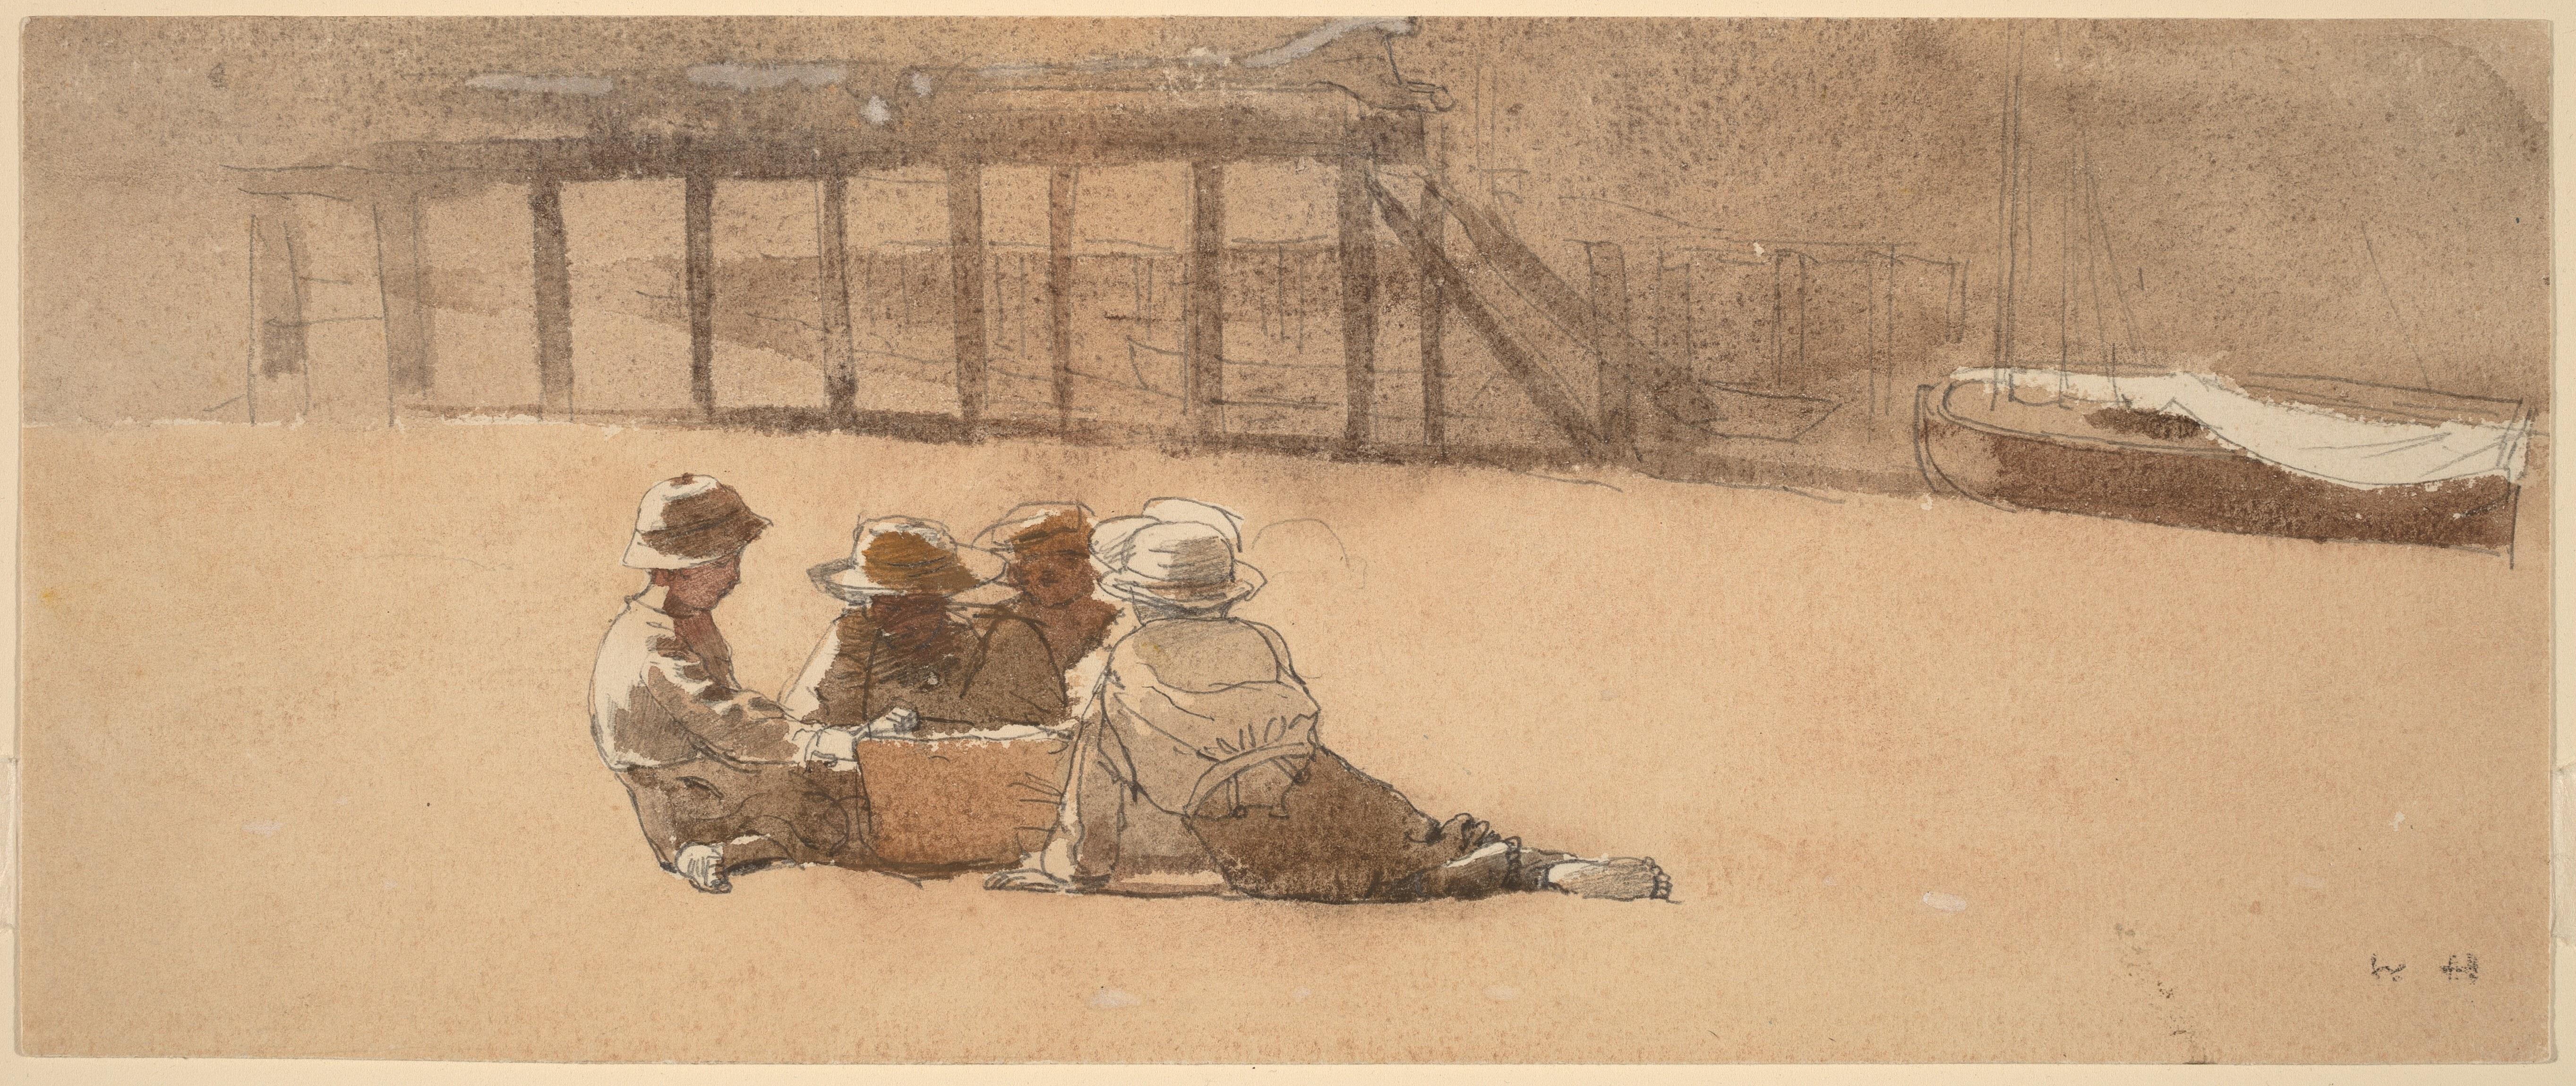 be59743e4de File Winslow Homer - Four Boys on a Beach (c.1873).jpg - Wikimedia ...